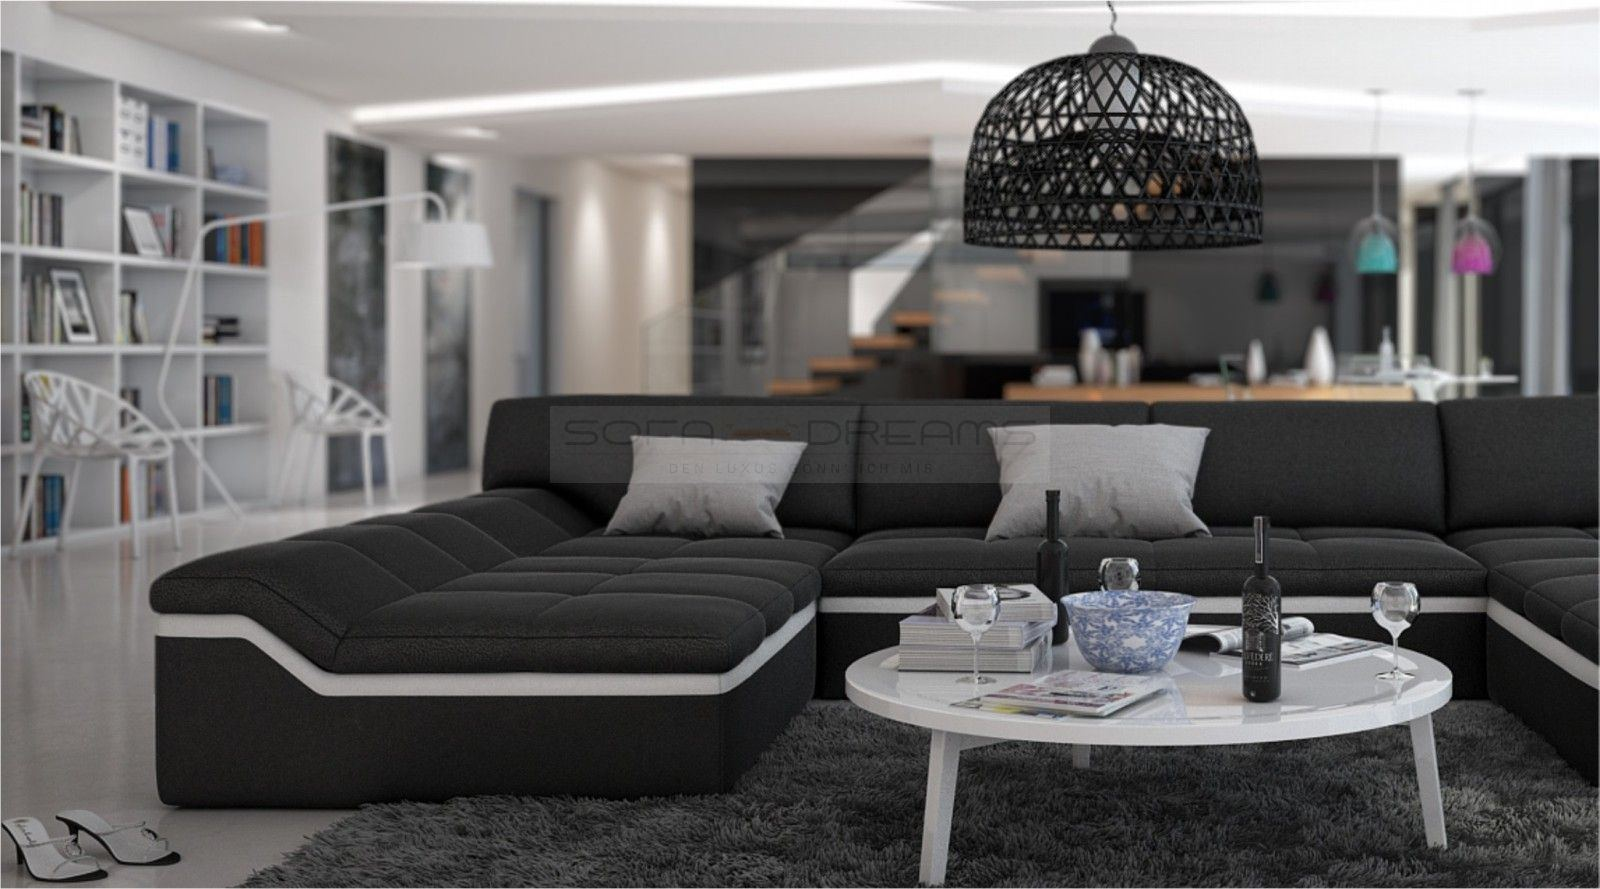 ecksofa wohnlandschaft modern relaxsofa barari u form sofa design couch ottomane ebay